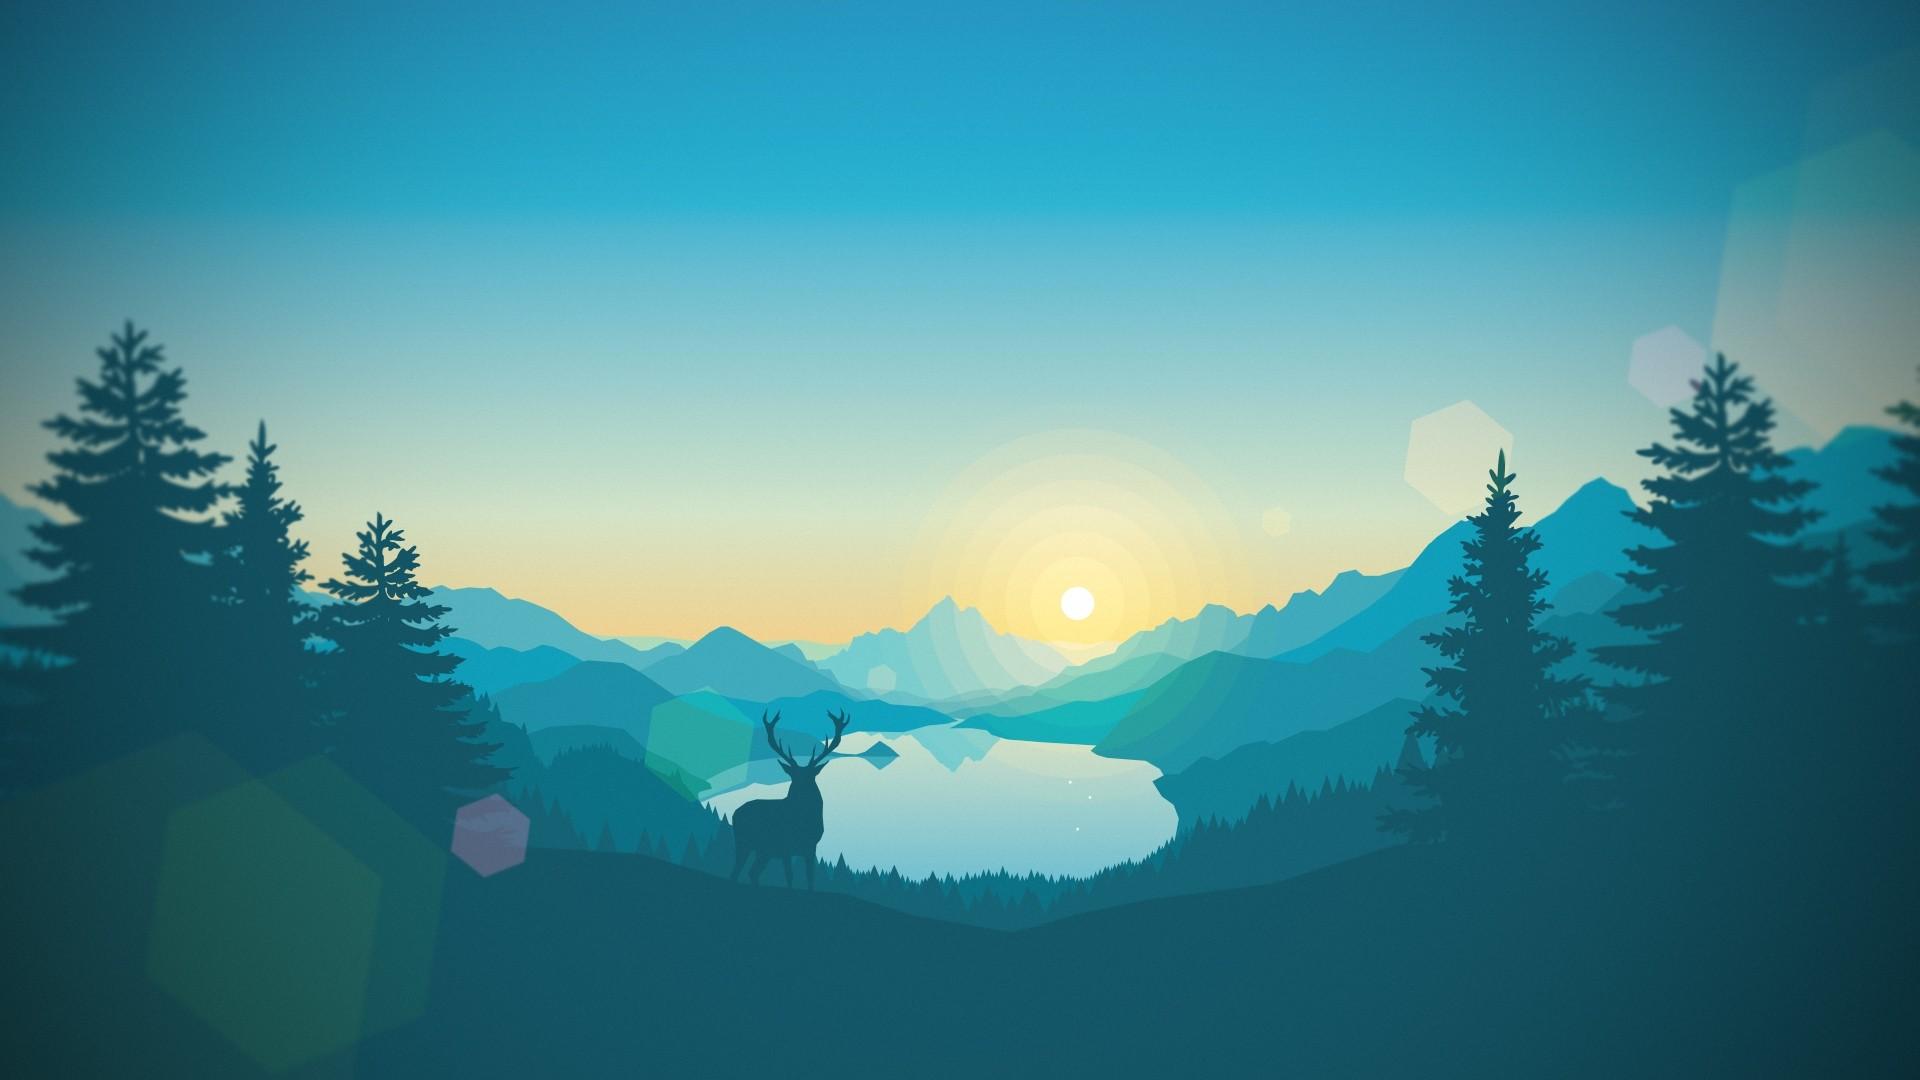 Nature Minimalist Style Image